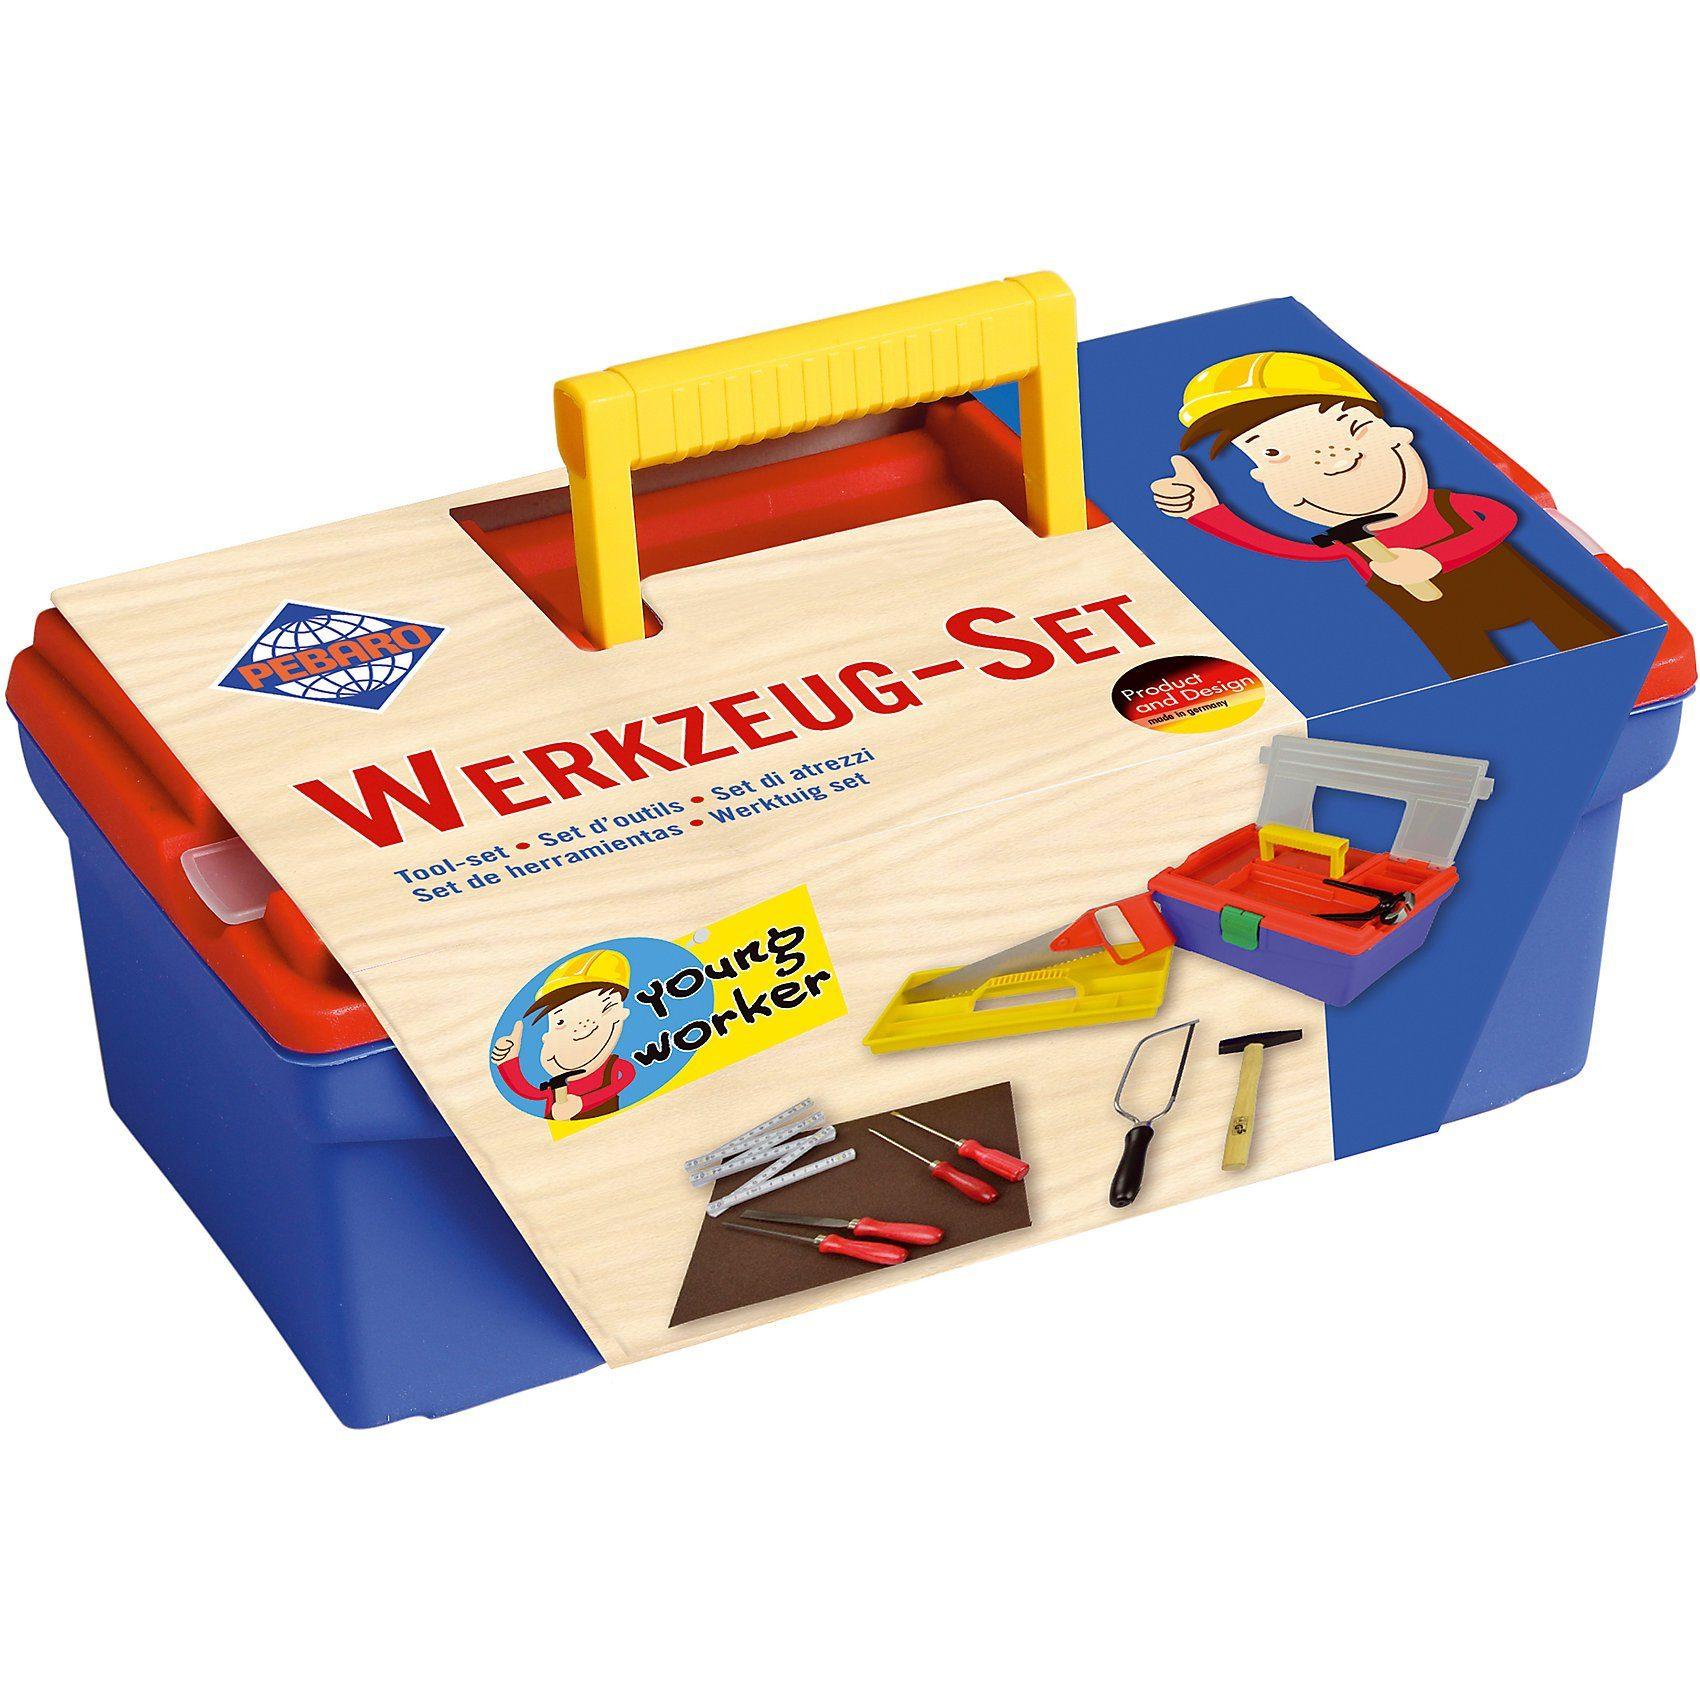 Pebaro Werkzeug-Set im Plastikkoffer